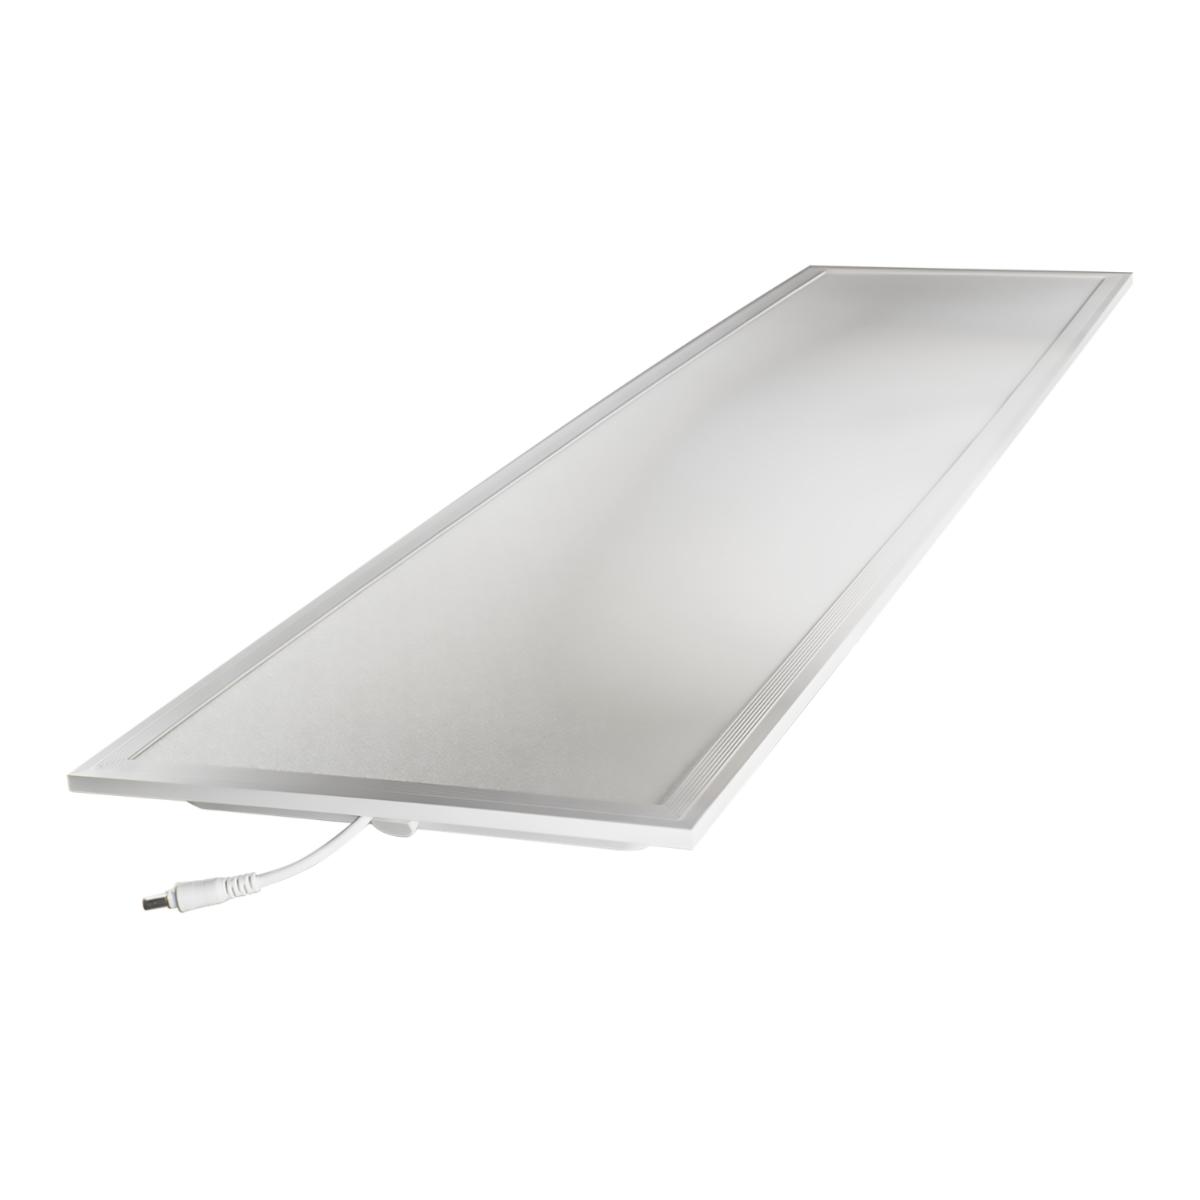 Noxion LED Paneel Econox 32W 30x120cm 6500K 4400lm UGR <22 | Daglicht - Vervangt 2x36W